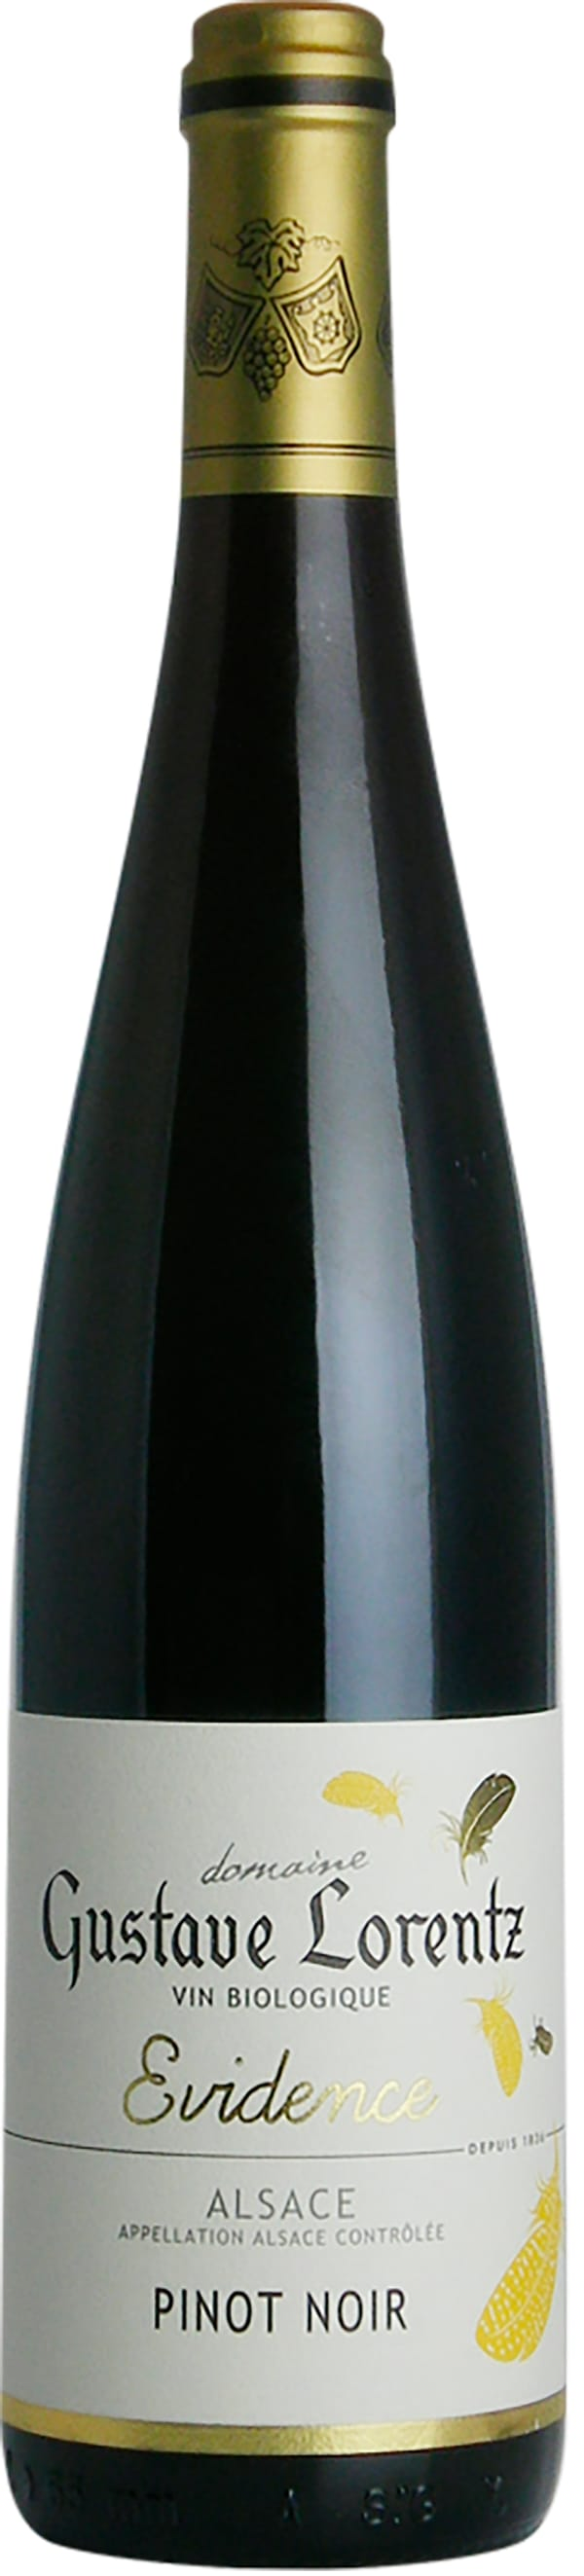 Gustave Lorentz Évidence Pinot Noir  2015